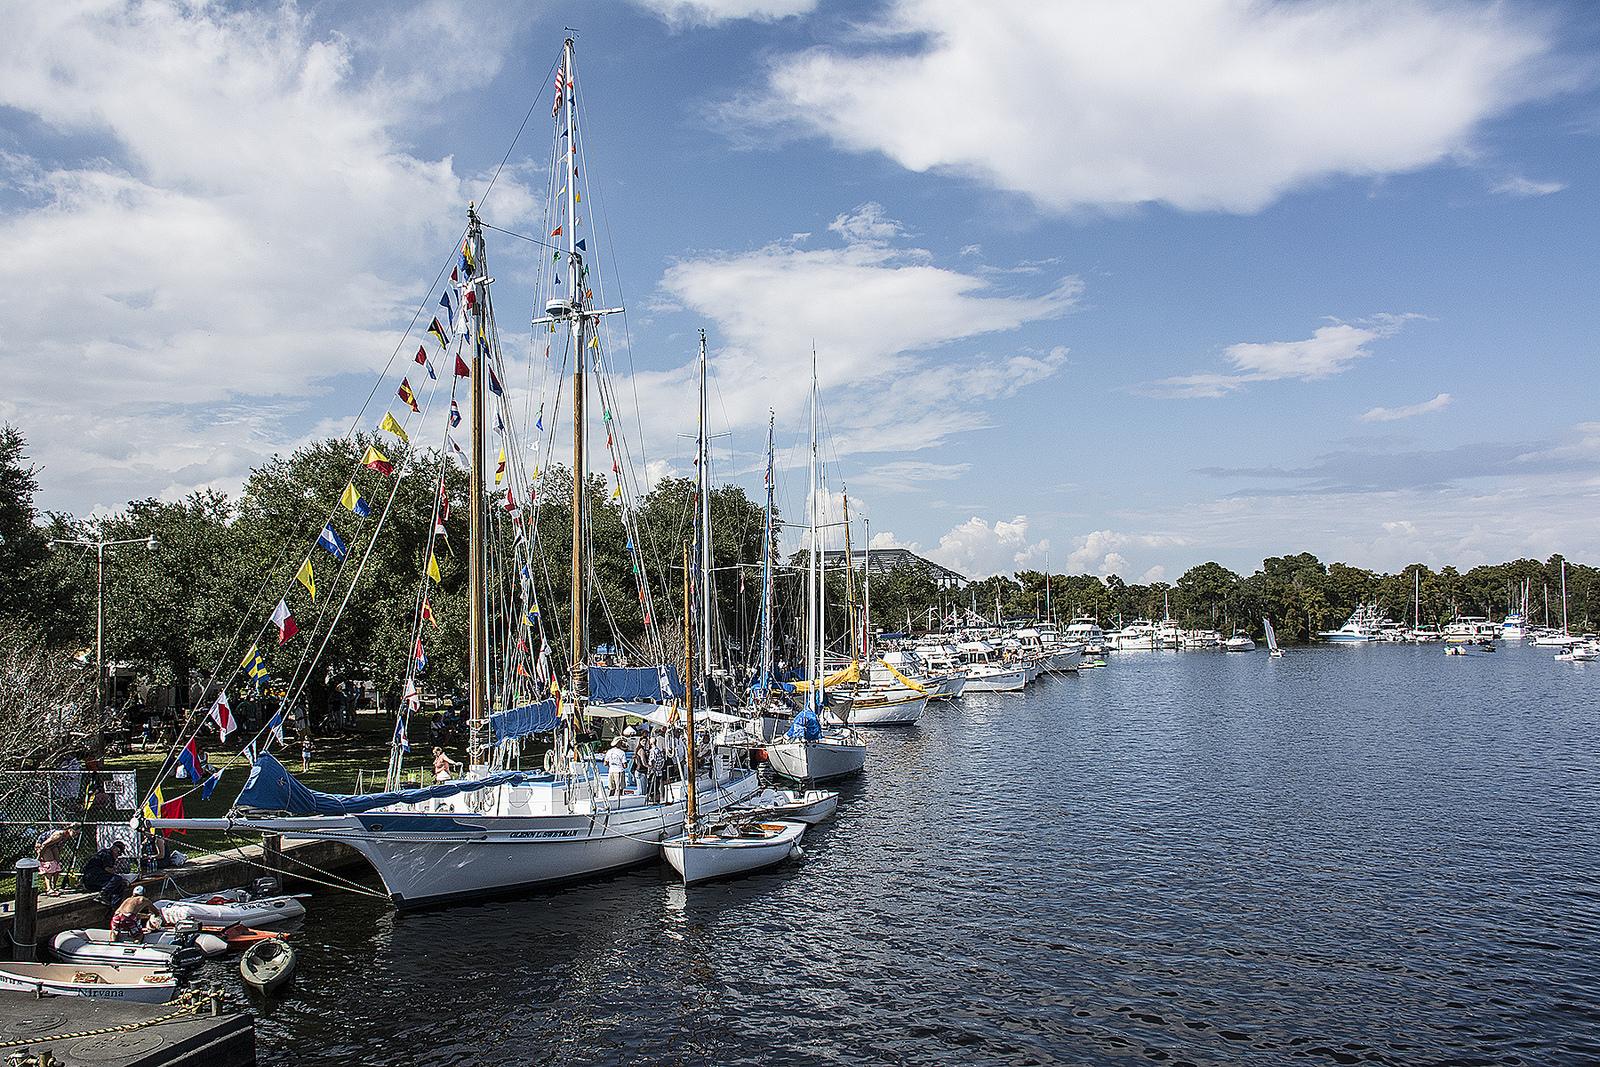 Madisonville Wooden Boat Festival Madisonville La 70447 October